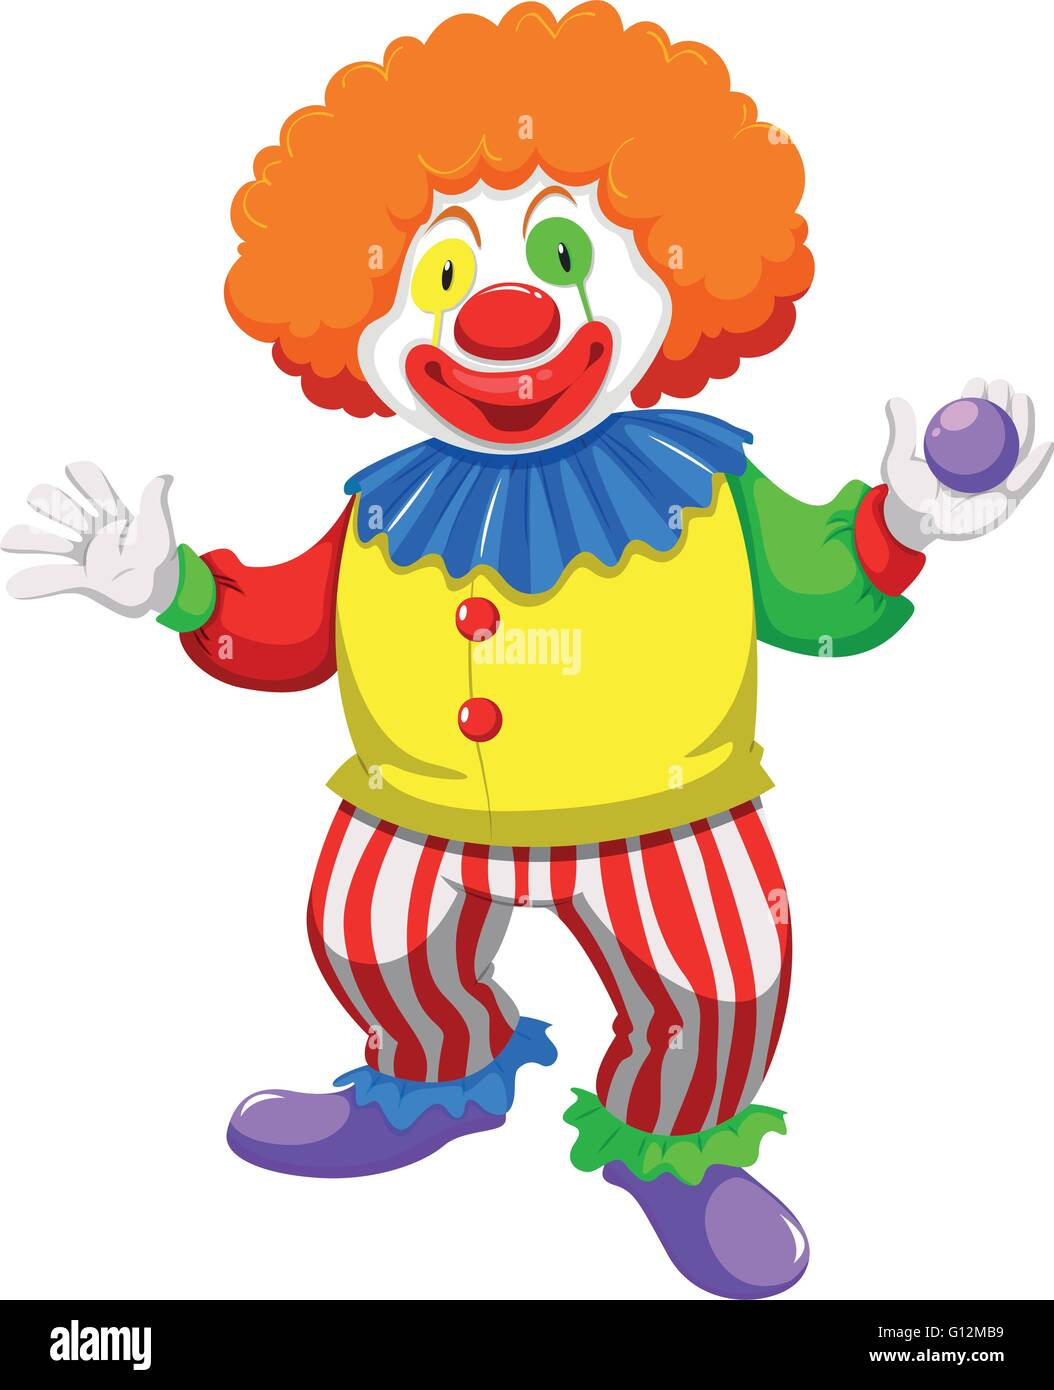 Clown holding a ball illustration - Stock Vector